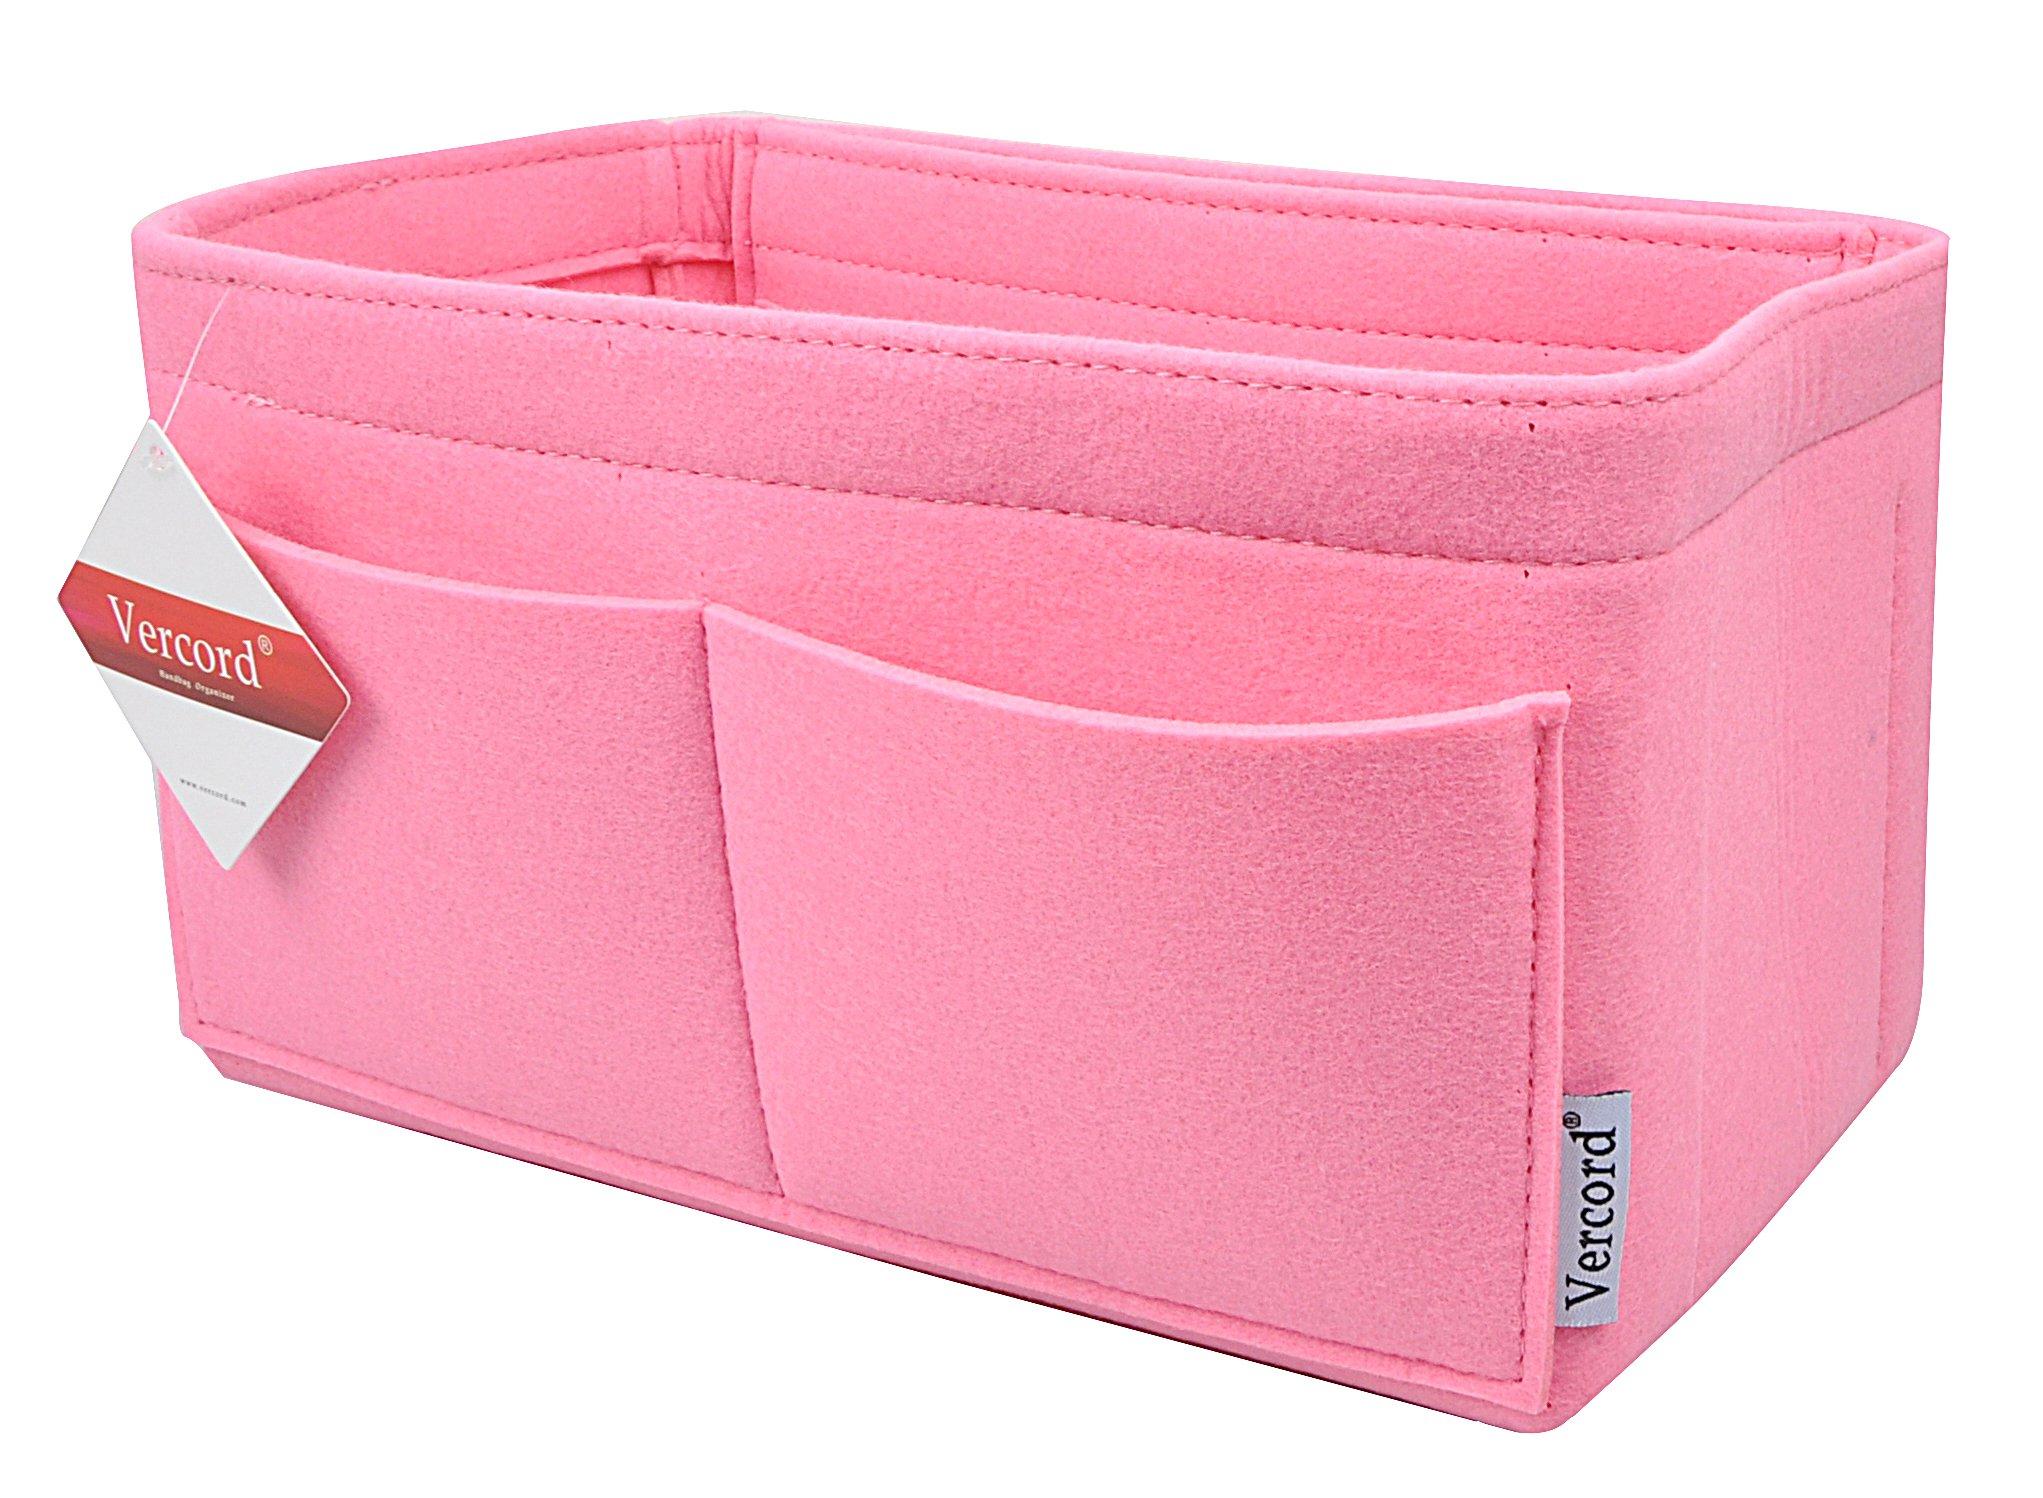 Felt Handbag organizer,Insert Purse Organizer 10 Pockets Structure Shaper 2 Size (S, Pink)